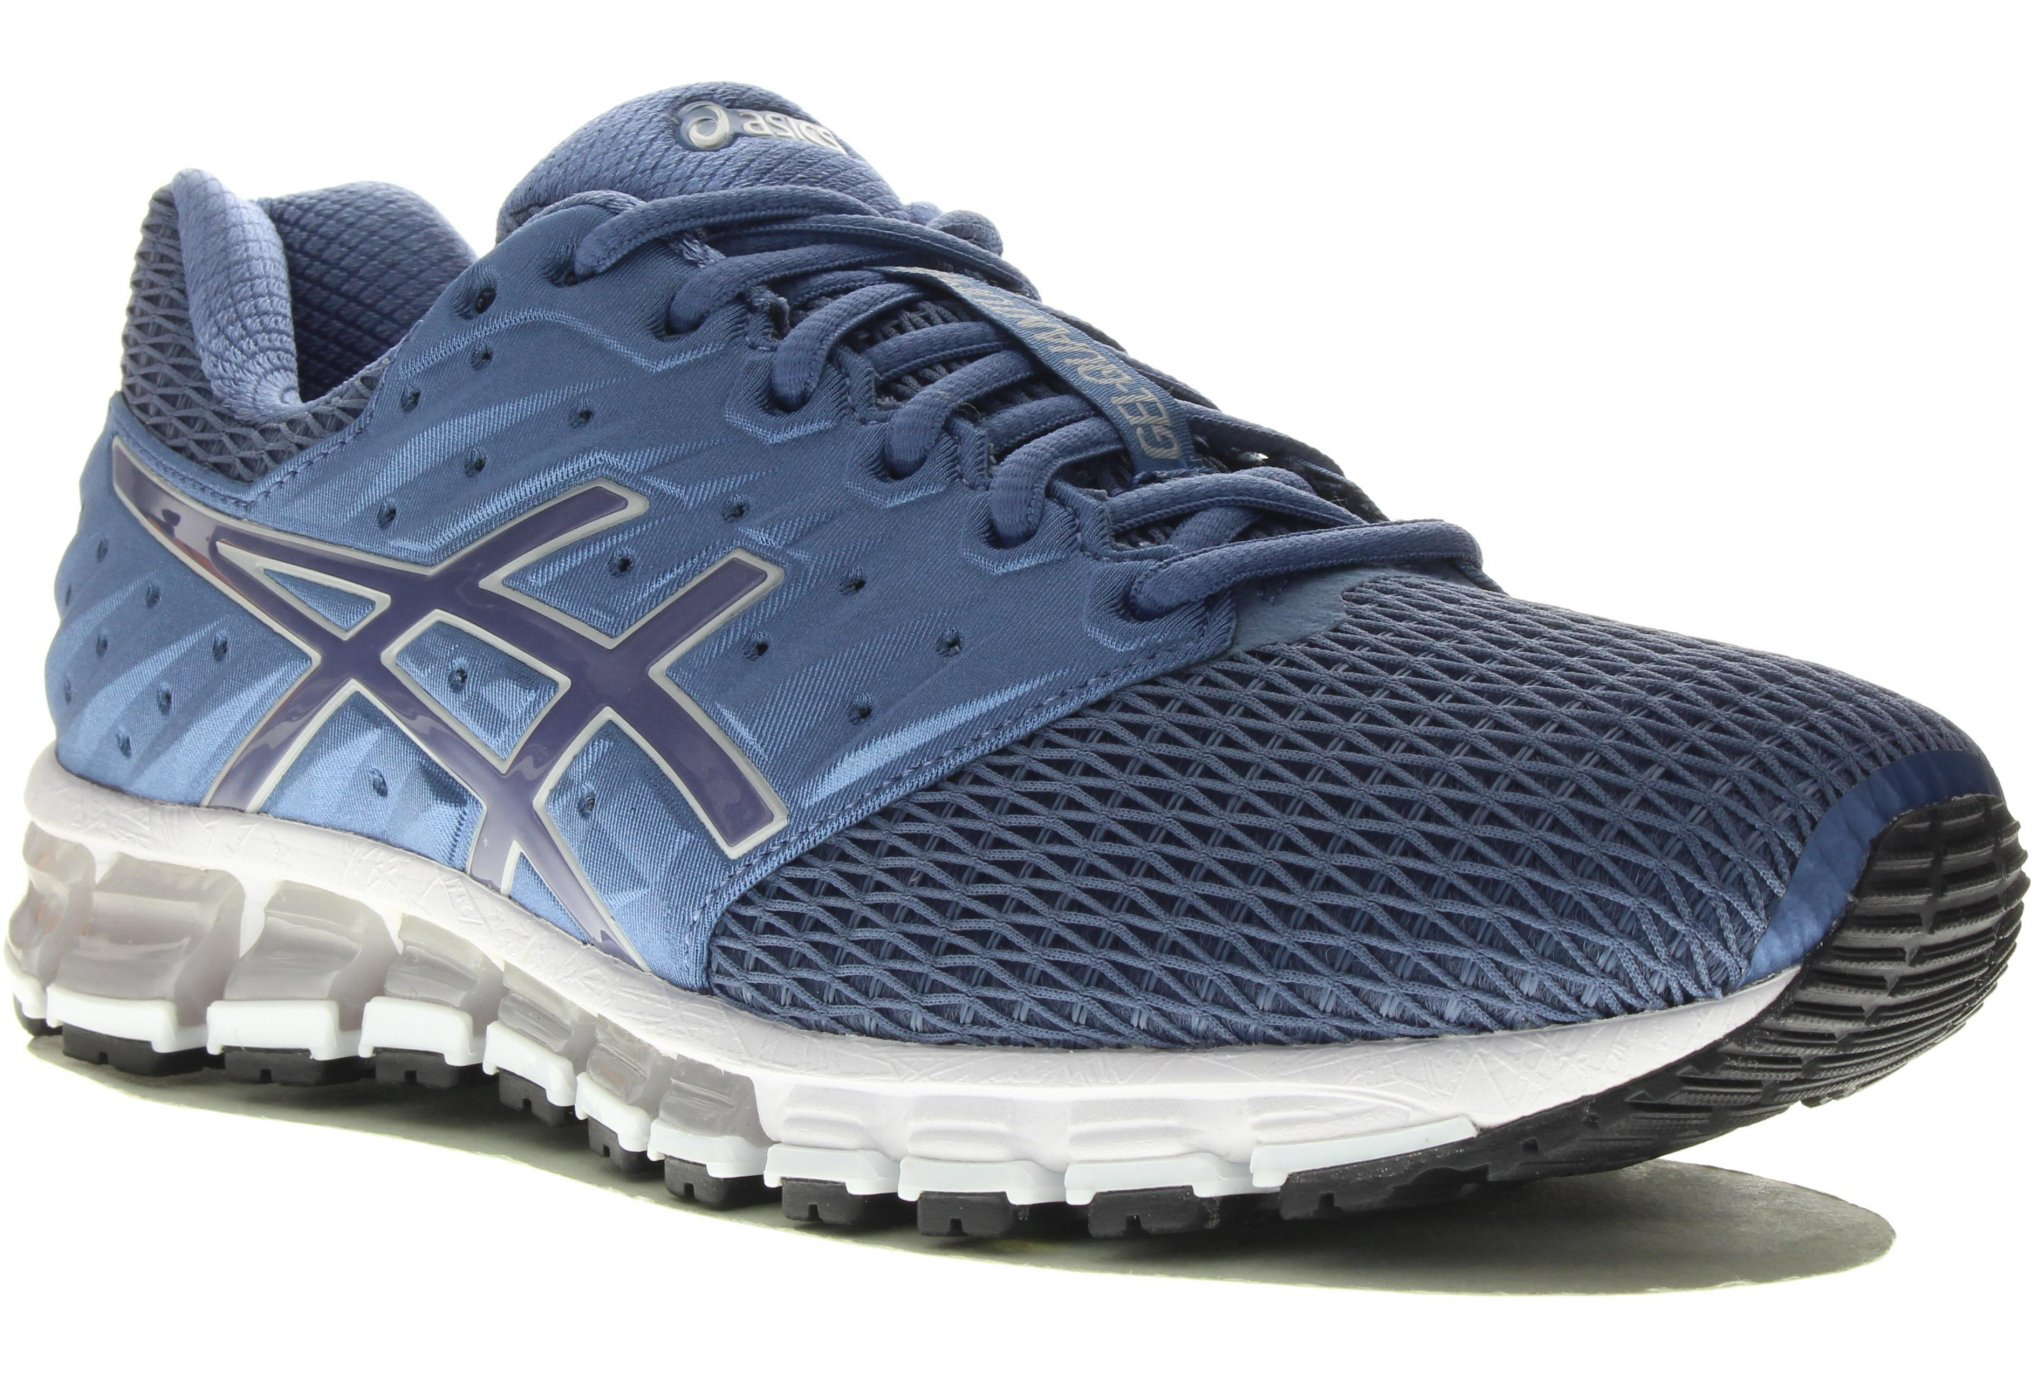 Asics GEL-Quantum 180 2 Expert Chaussures homme